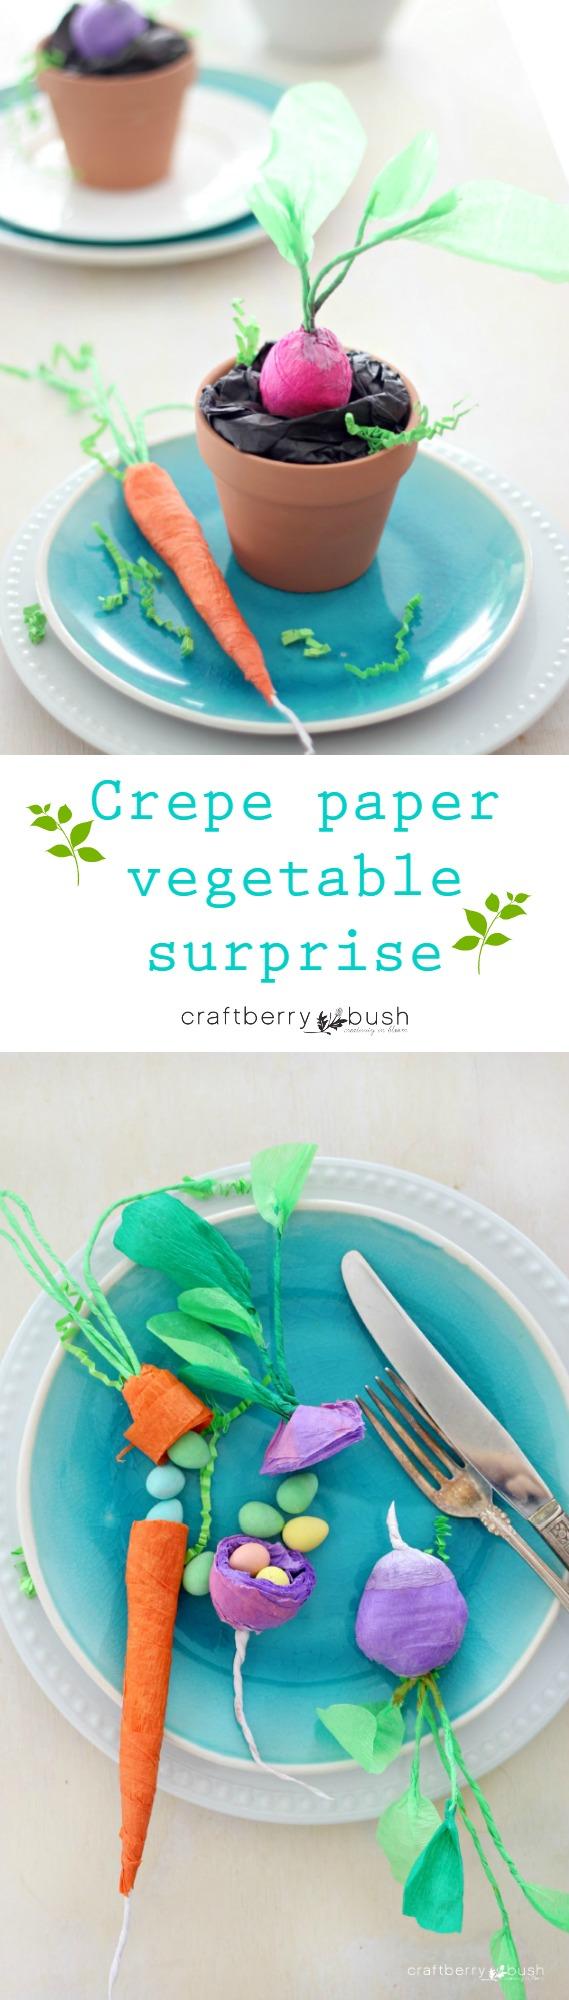 Crepepapervegetablesurpriseballcraftberrybush4